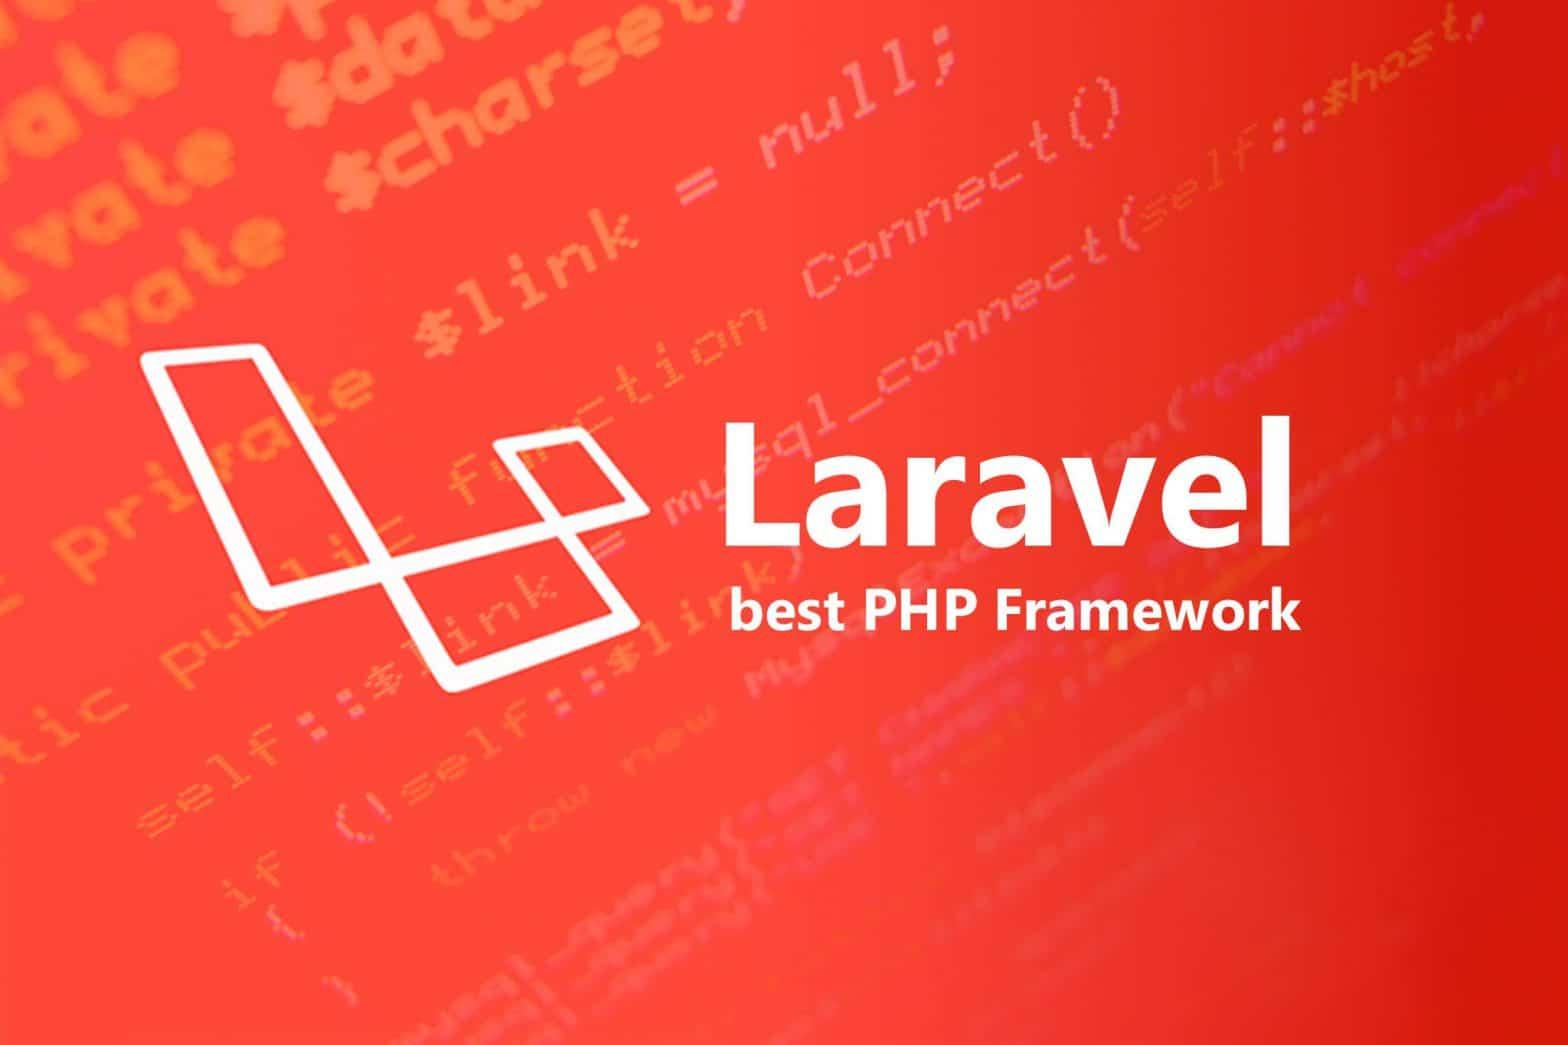 các framework php phổ biến